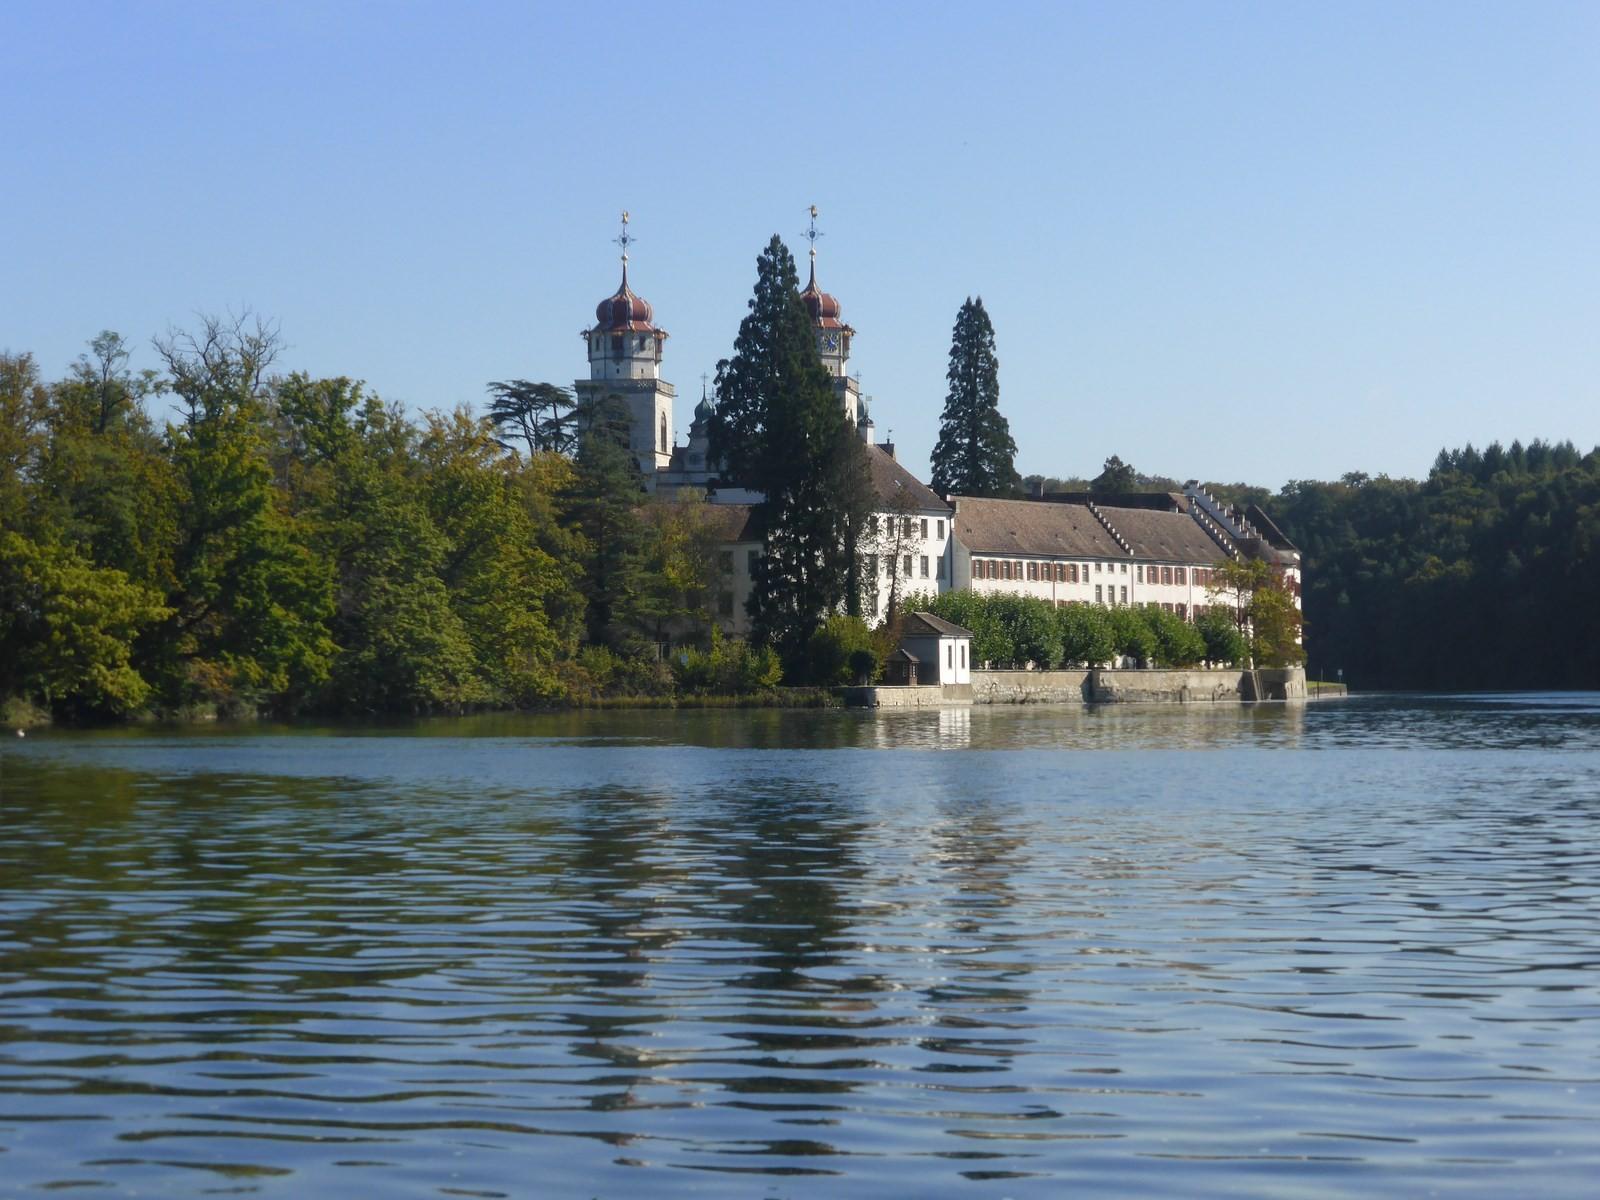 Kloster Rheinau C Hartmut Hermanns